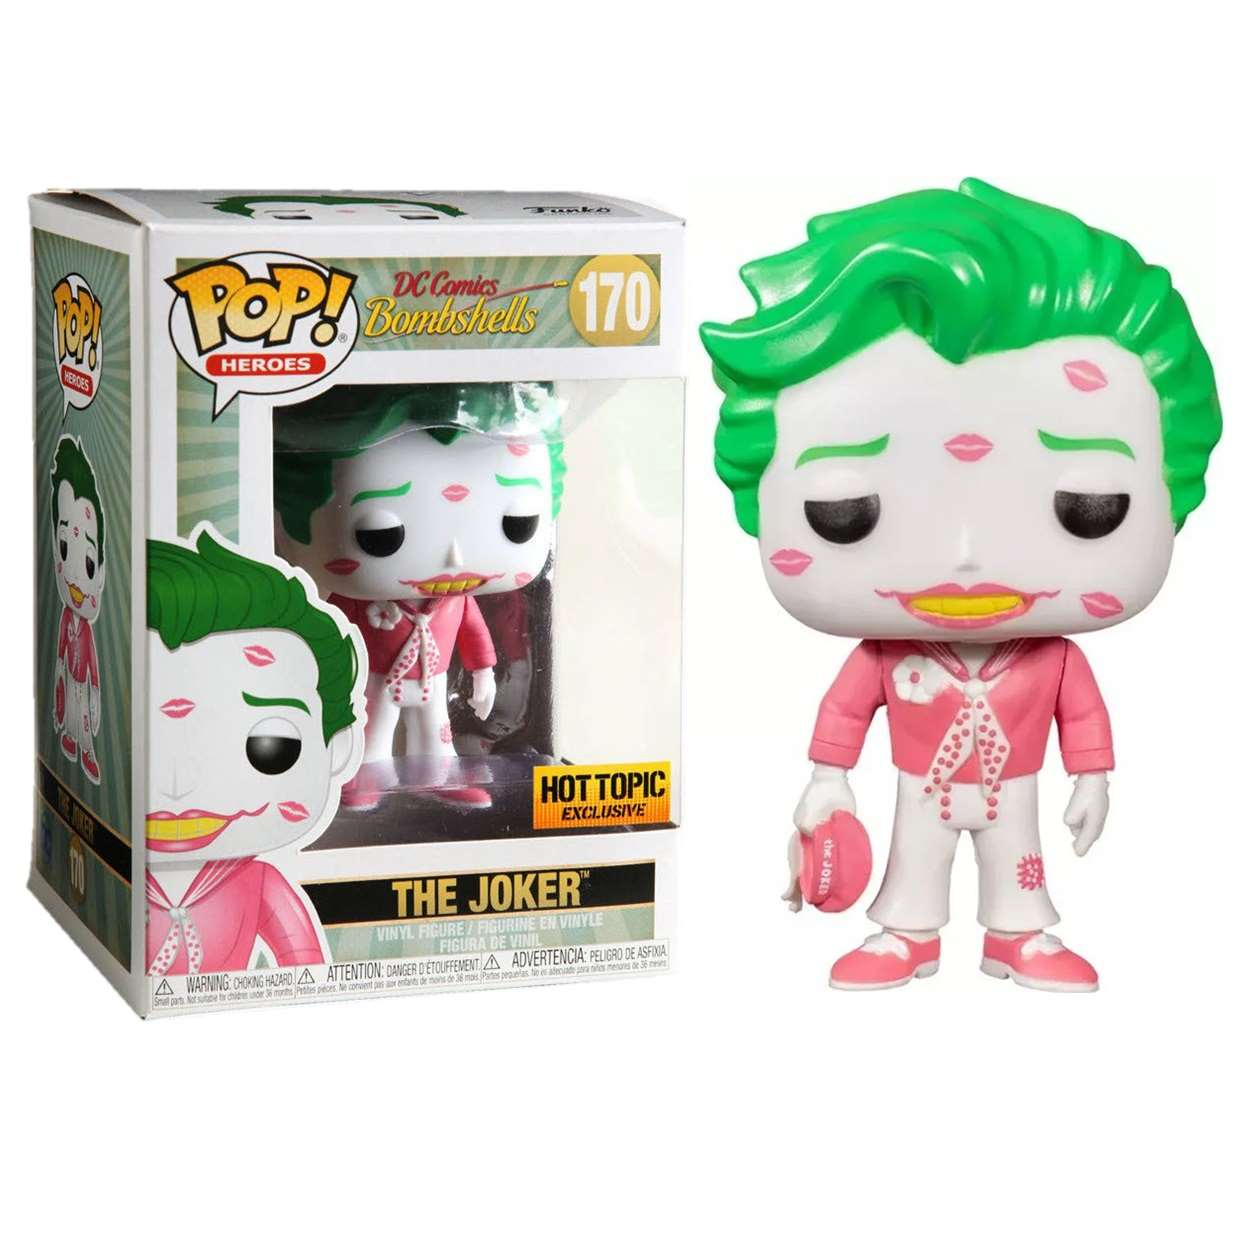 The Joker #170 Figura Dc Comic Bombshell Funko Pop! Exc Hot Topic